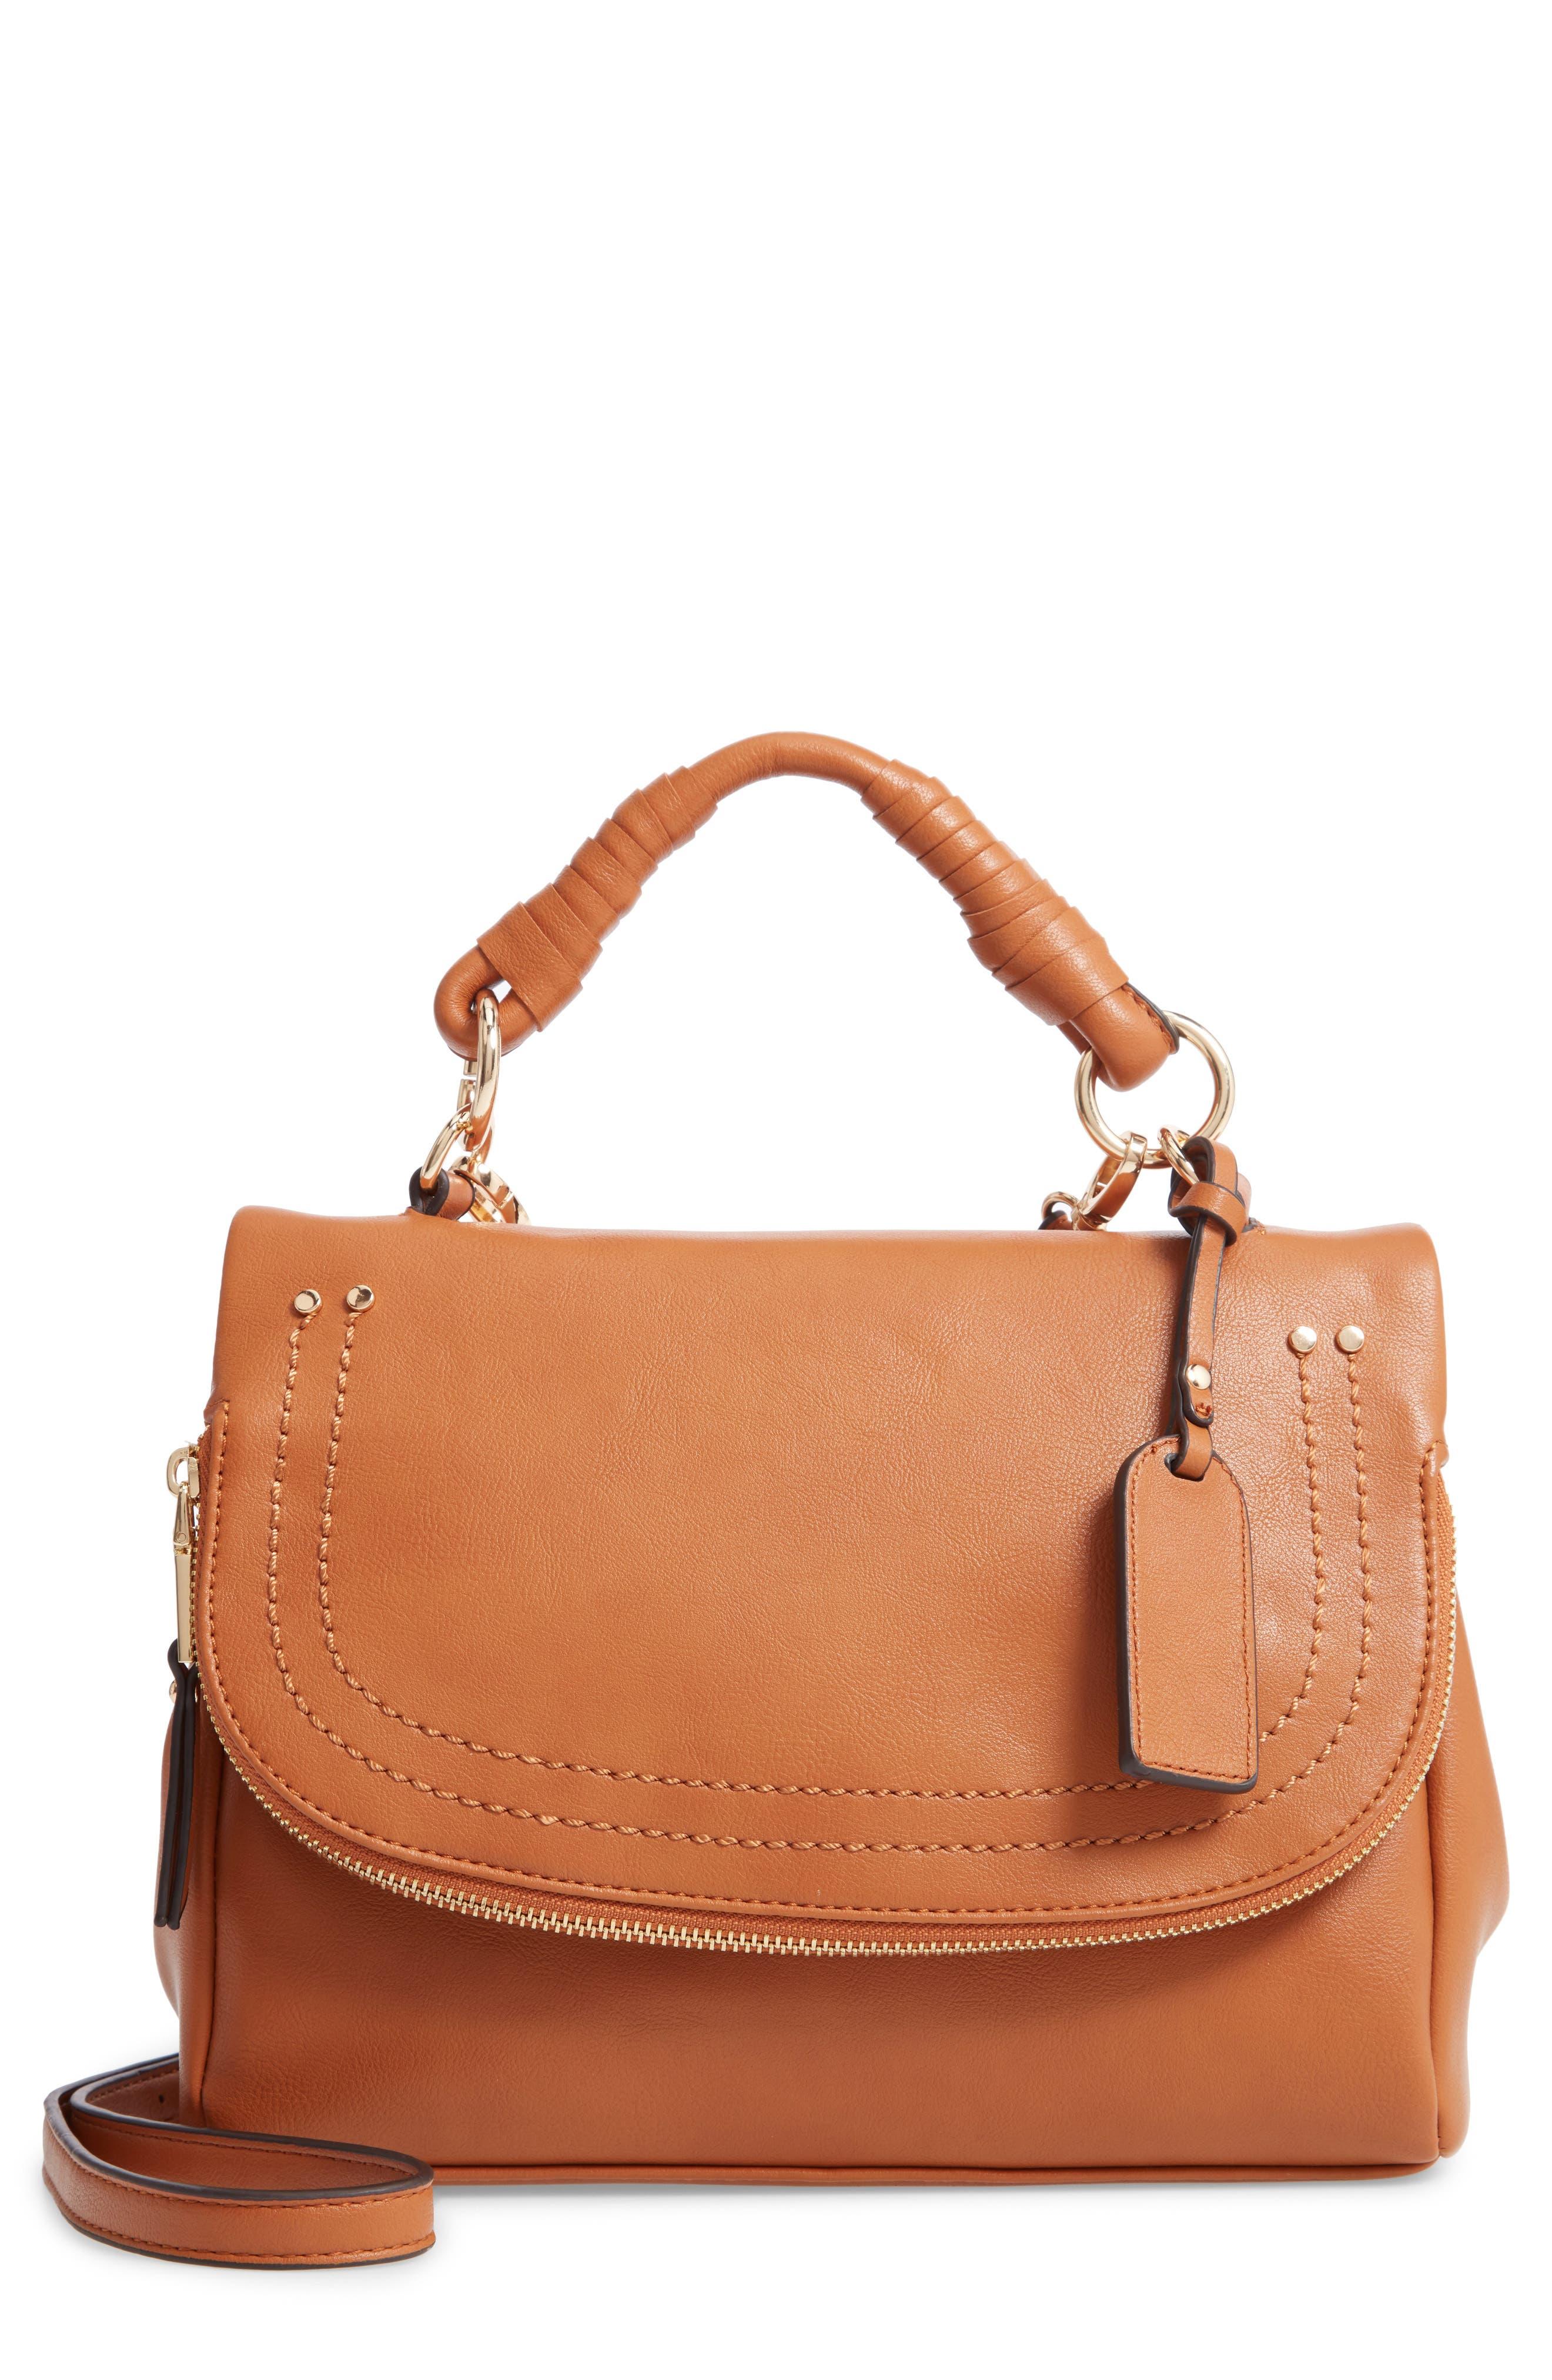 SOLE SOCIETY,                             Rubie Faux Leather Crossbody Bag,                             Main thumbnail 1, color,                             COGNAC